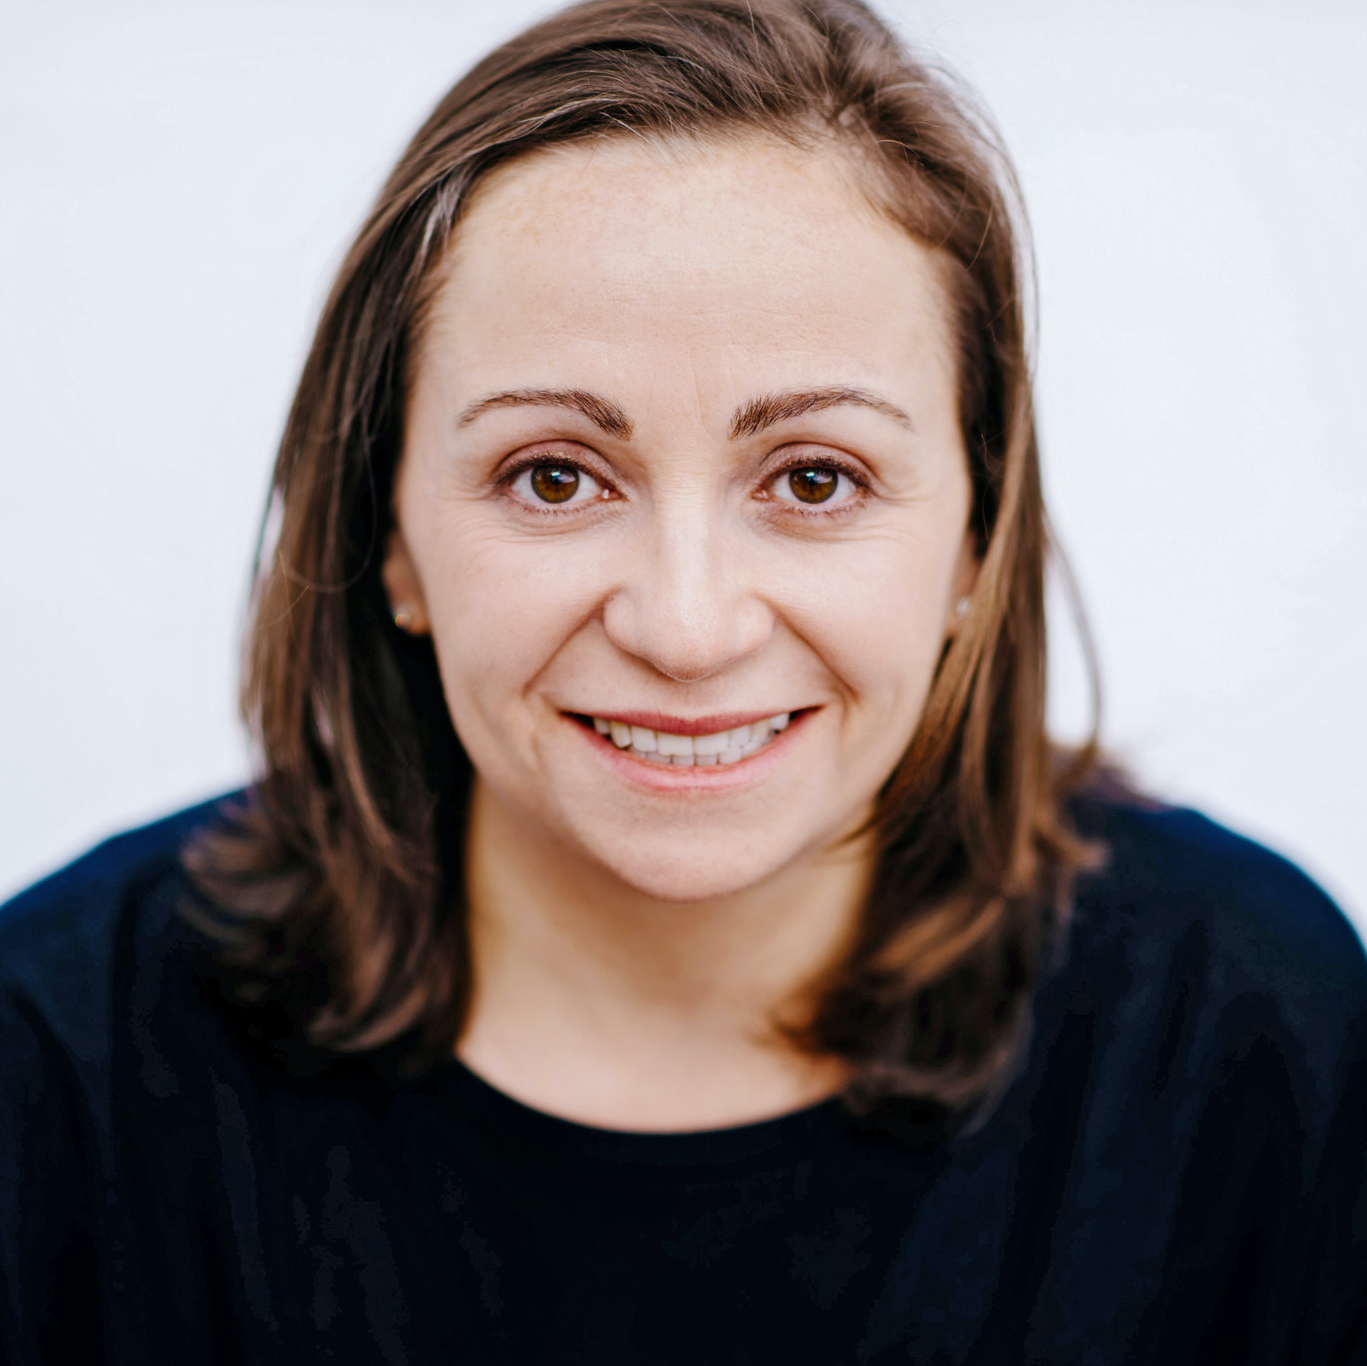 Rajia Hassib